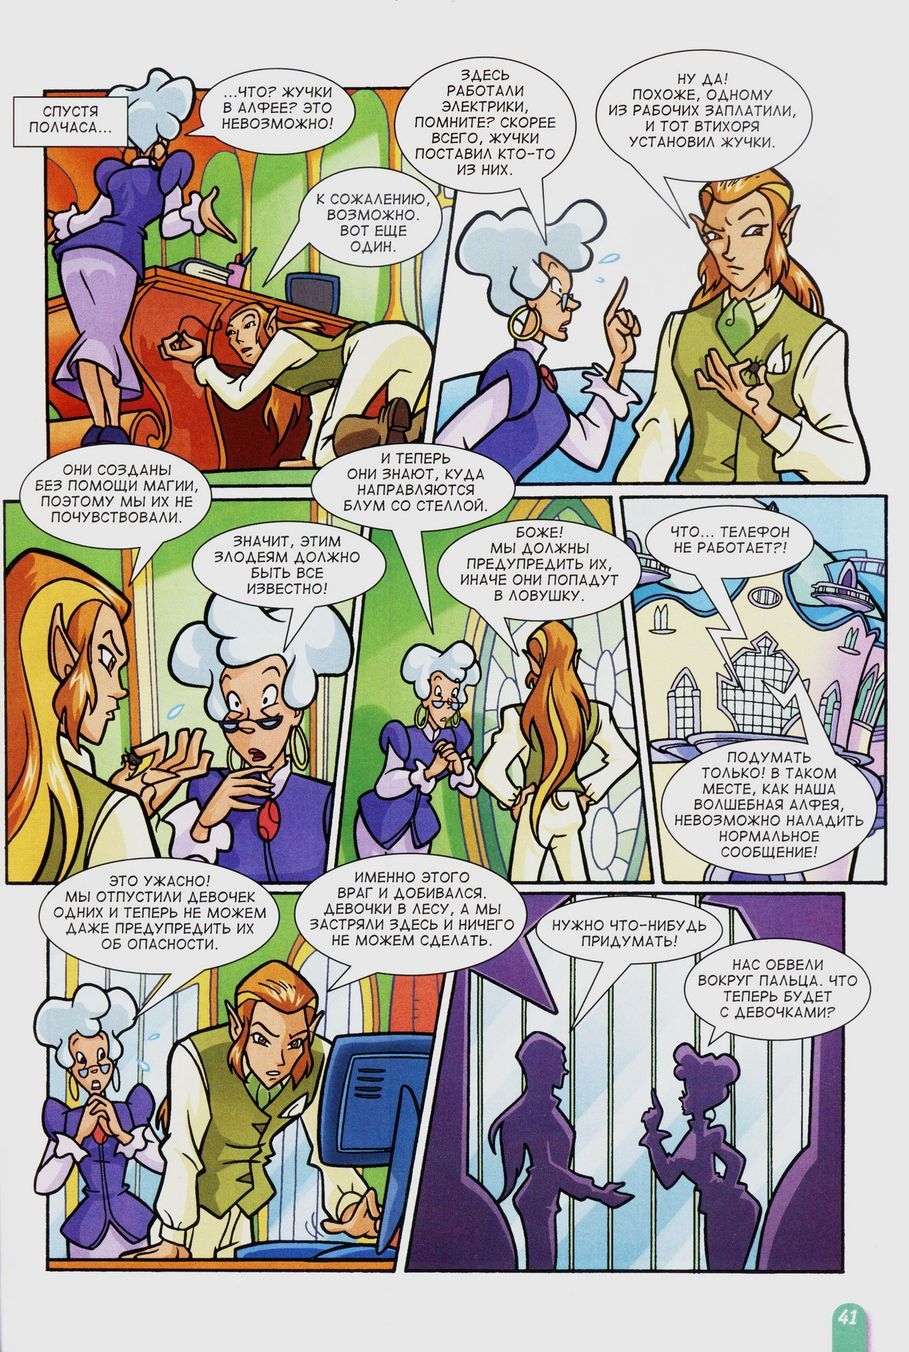 Комикс Винкс Winx - Волшебник Камуд (Журнал Винкс №6 2011) - стр. 41